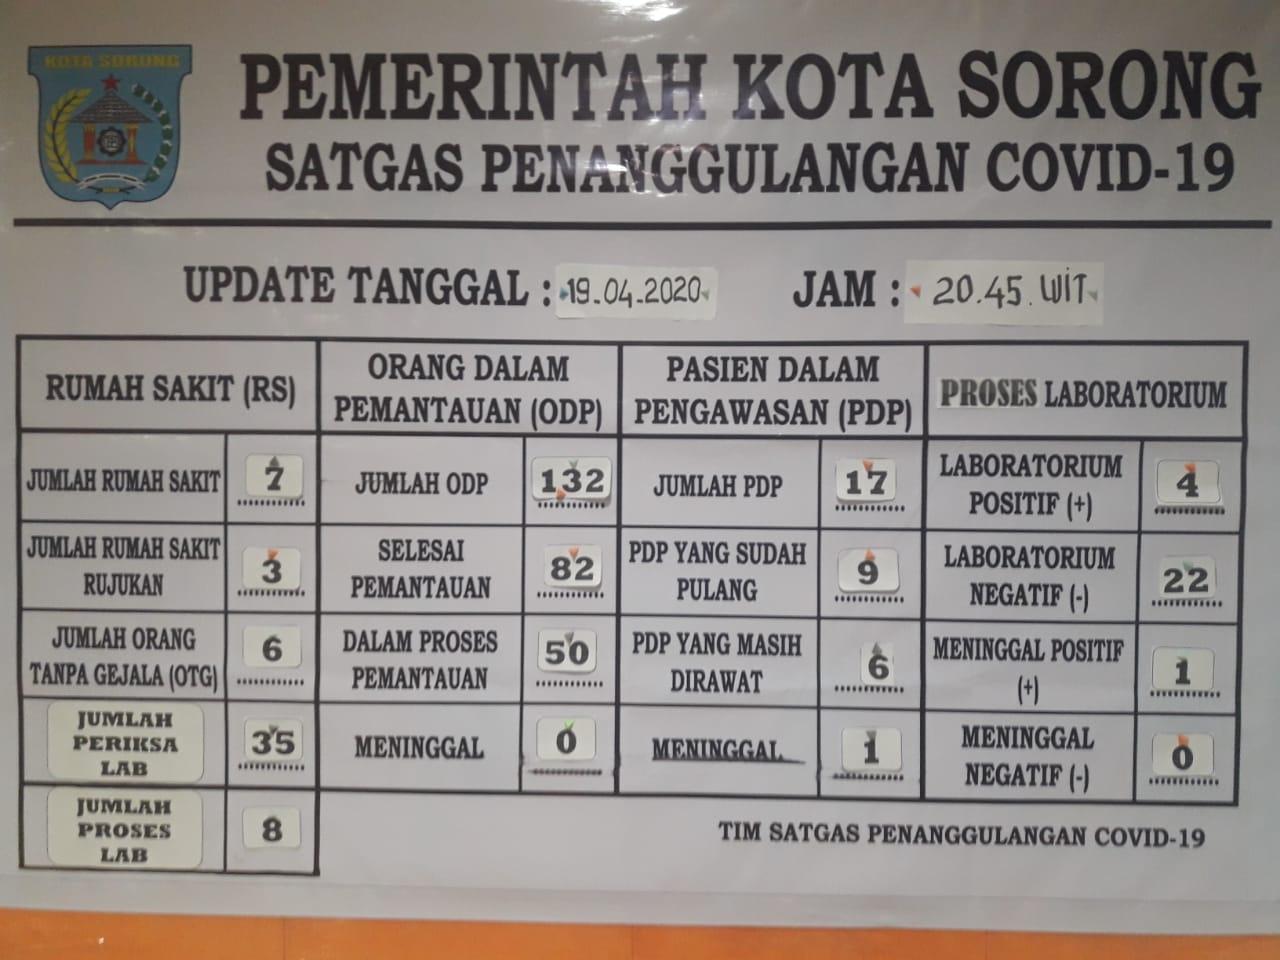 Warga Patut Waspada, Kota Sorong Jadi Transmisi Lokal Covid-19 2 IMG 20200420 WA0005 1